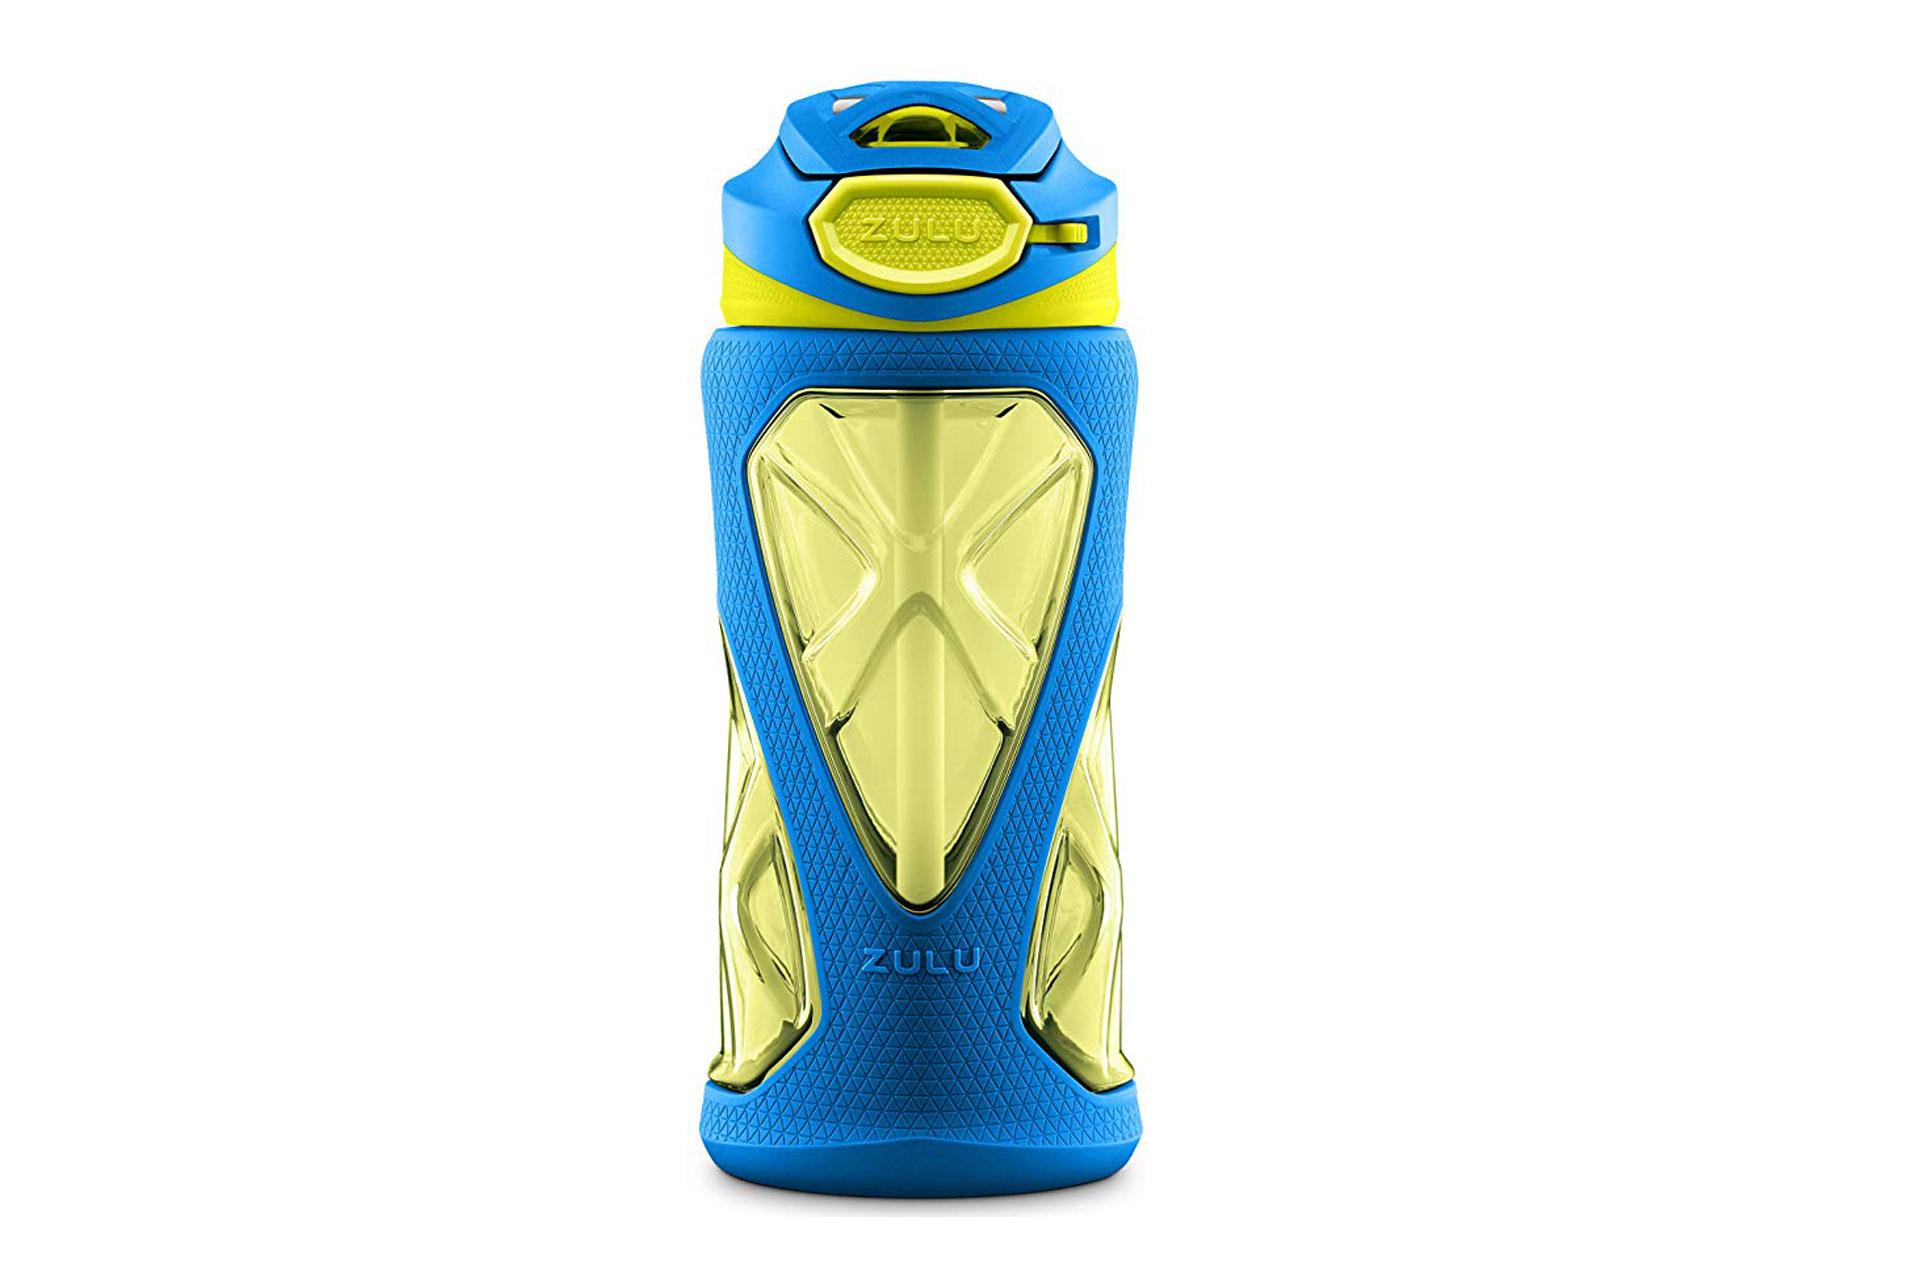 Zulu Water Bottle; Courtesy of Amazon